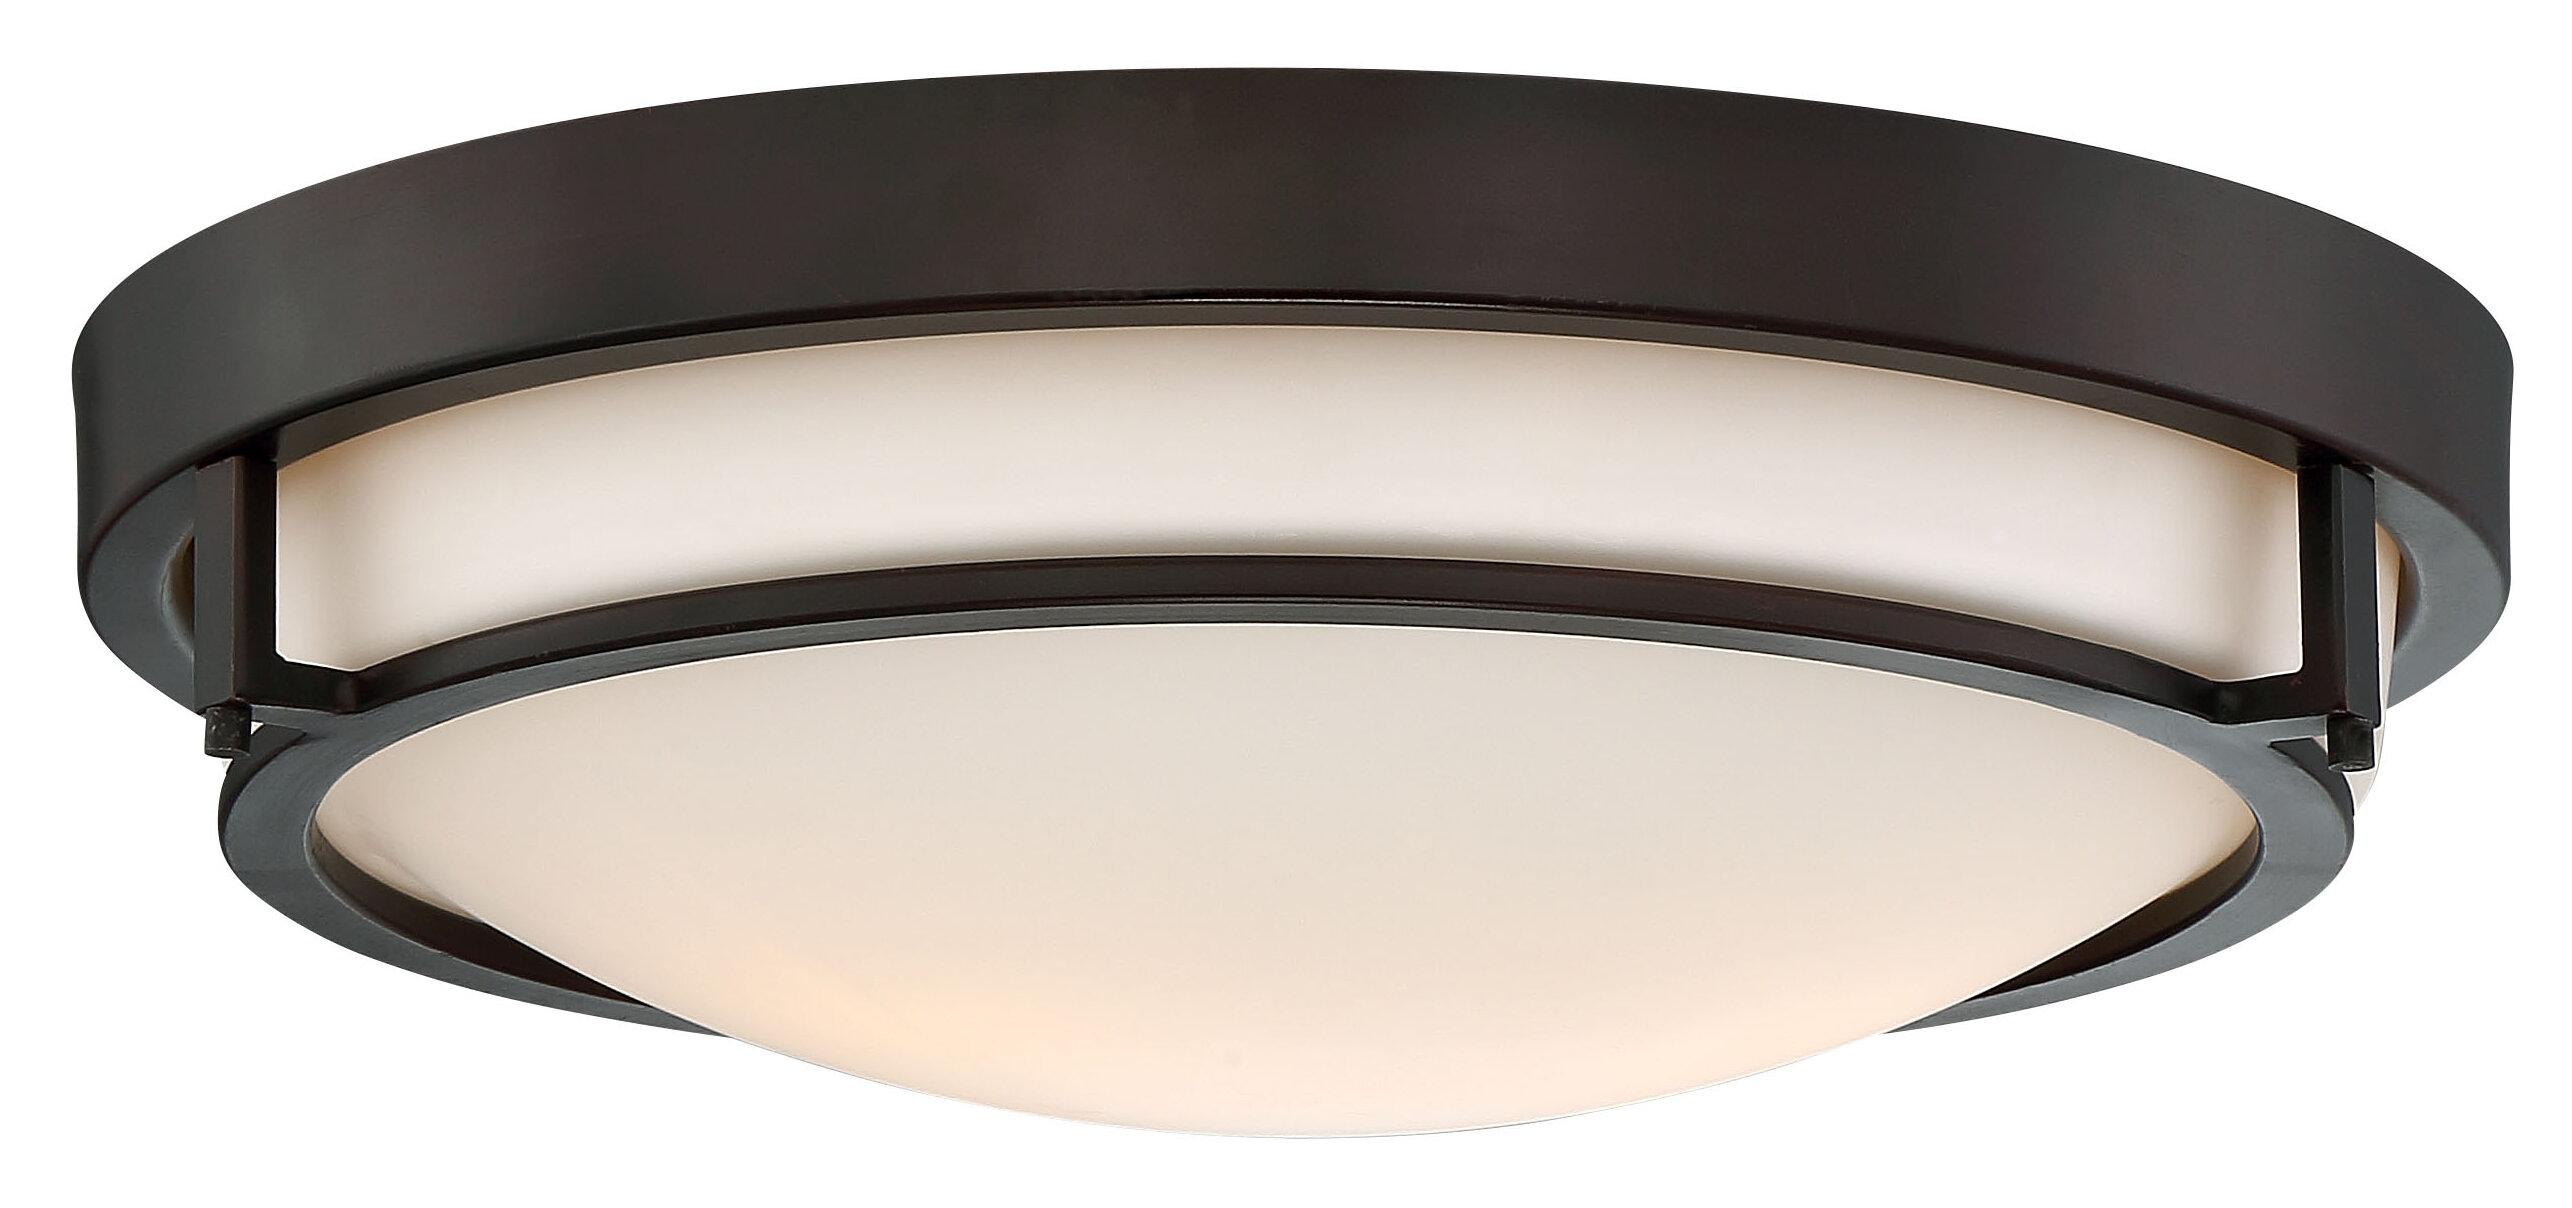 Galvanized Light Fixtures   Wayfair